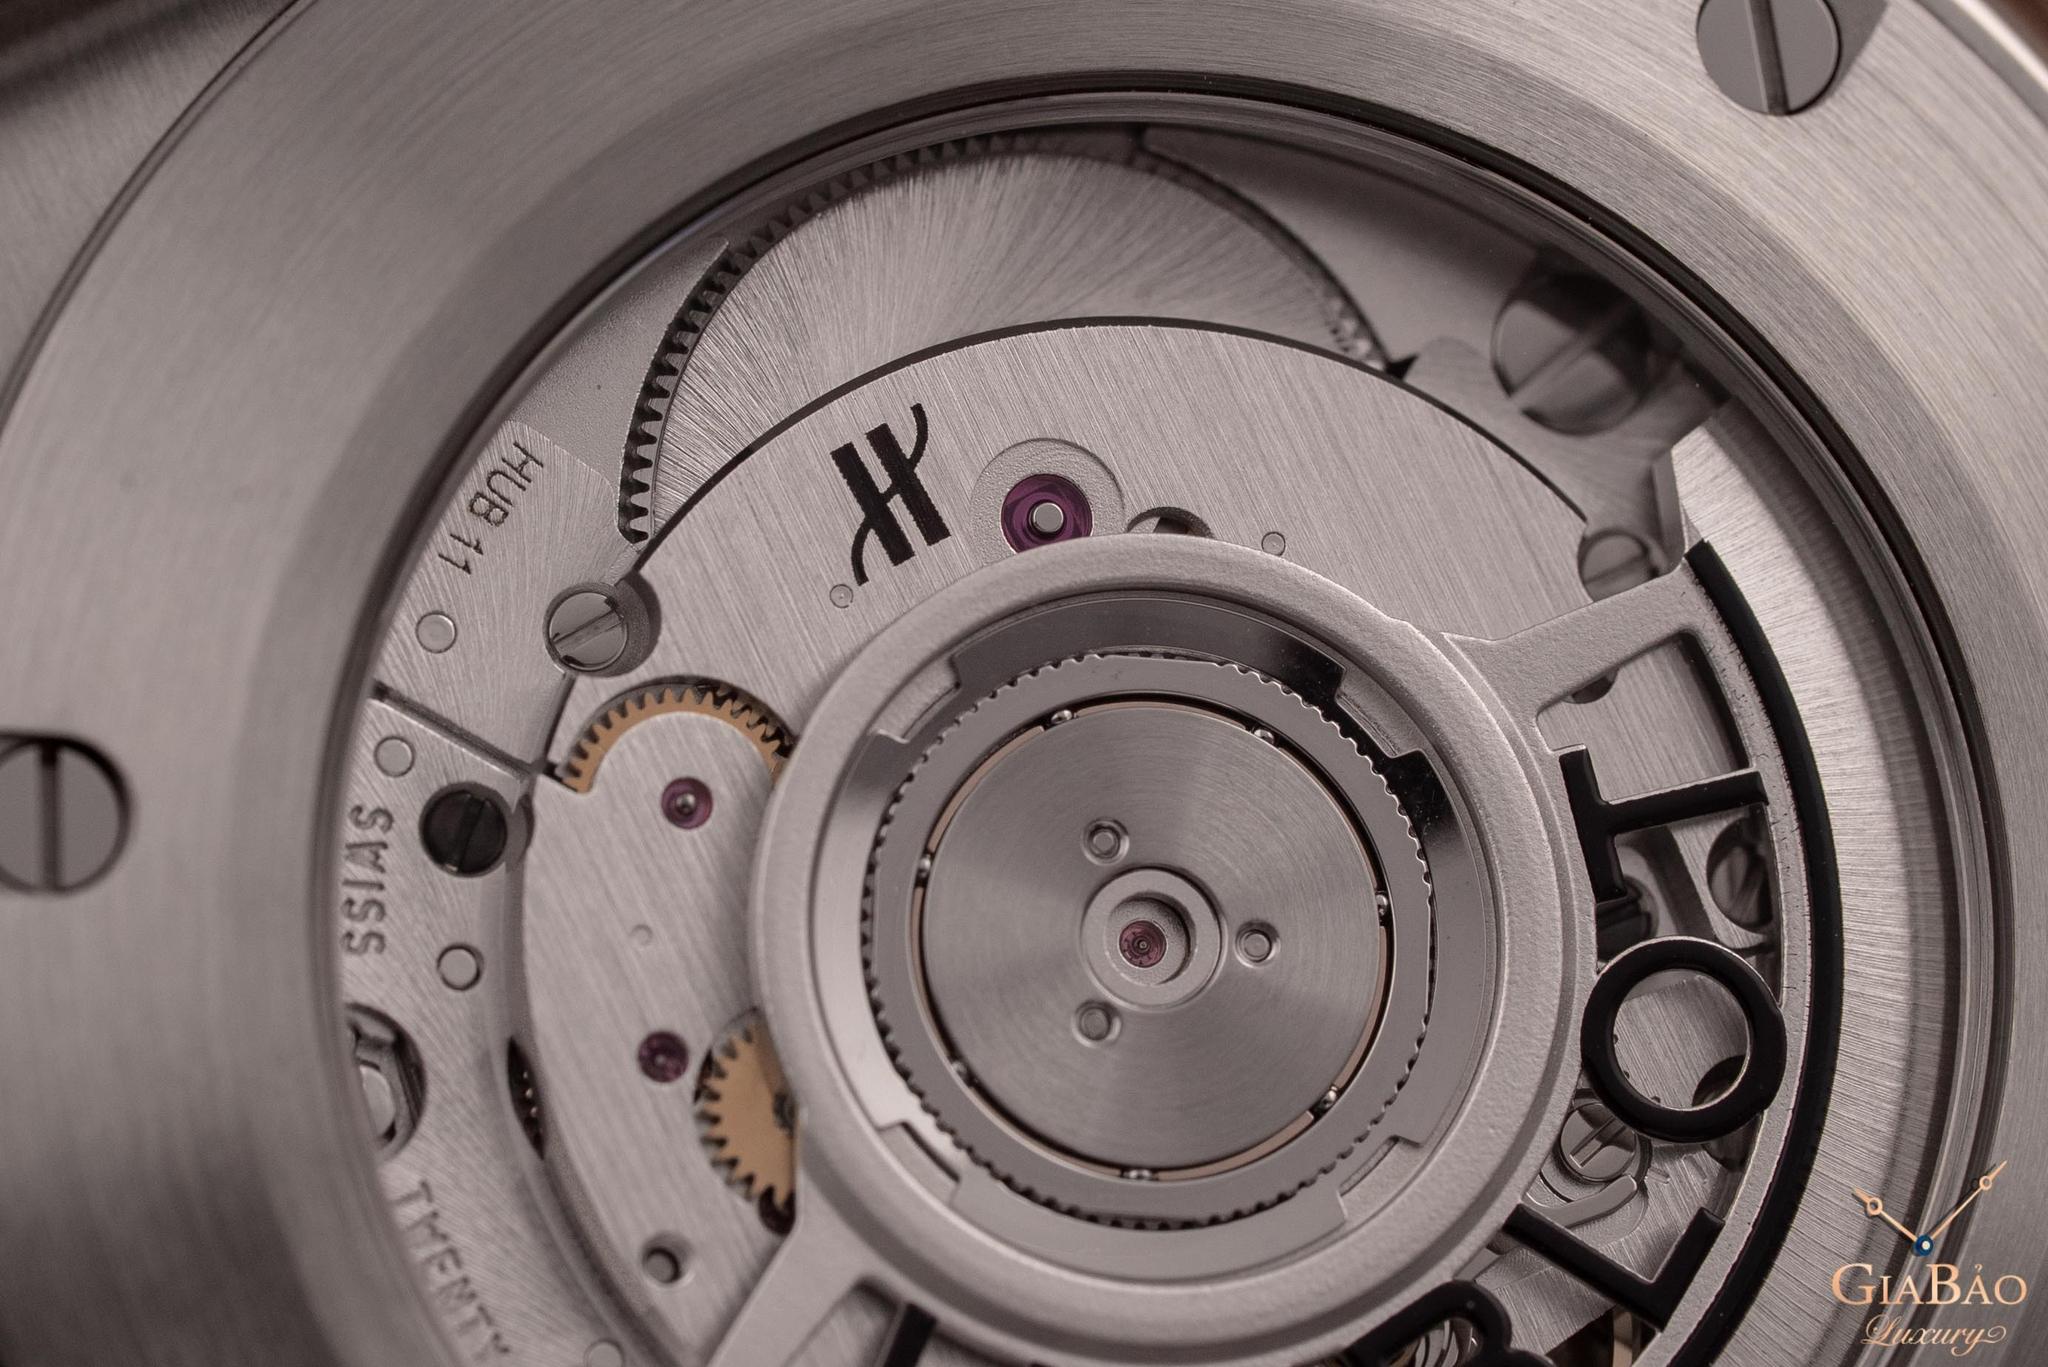 Đồng Hồ Hublot Classic Fusion Grey Titanium 42mm 511.NX.7071.LR